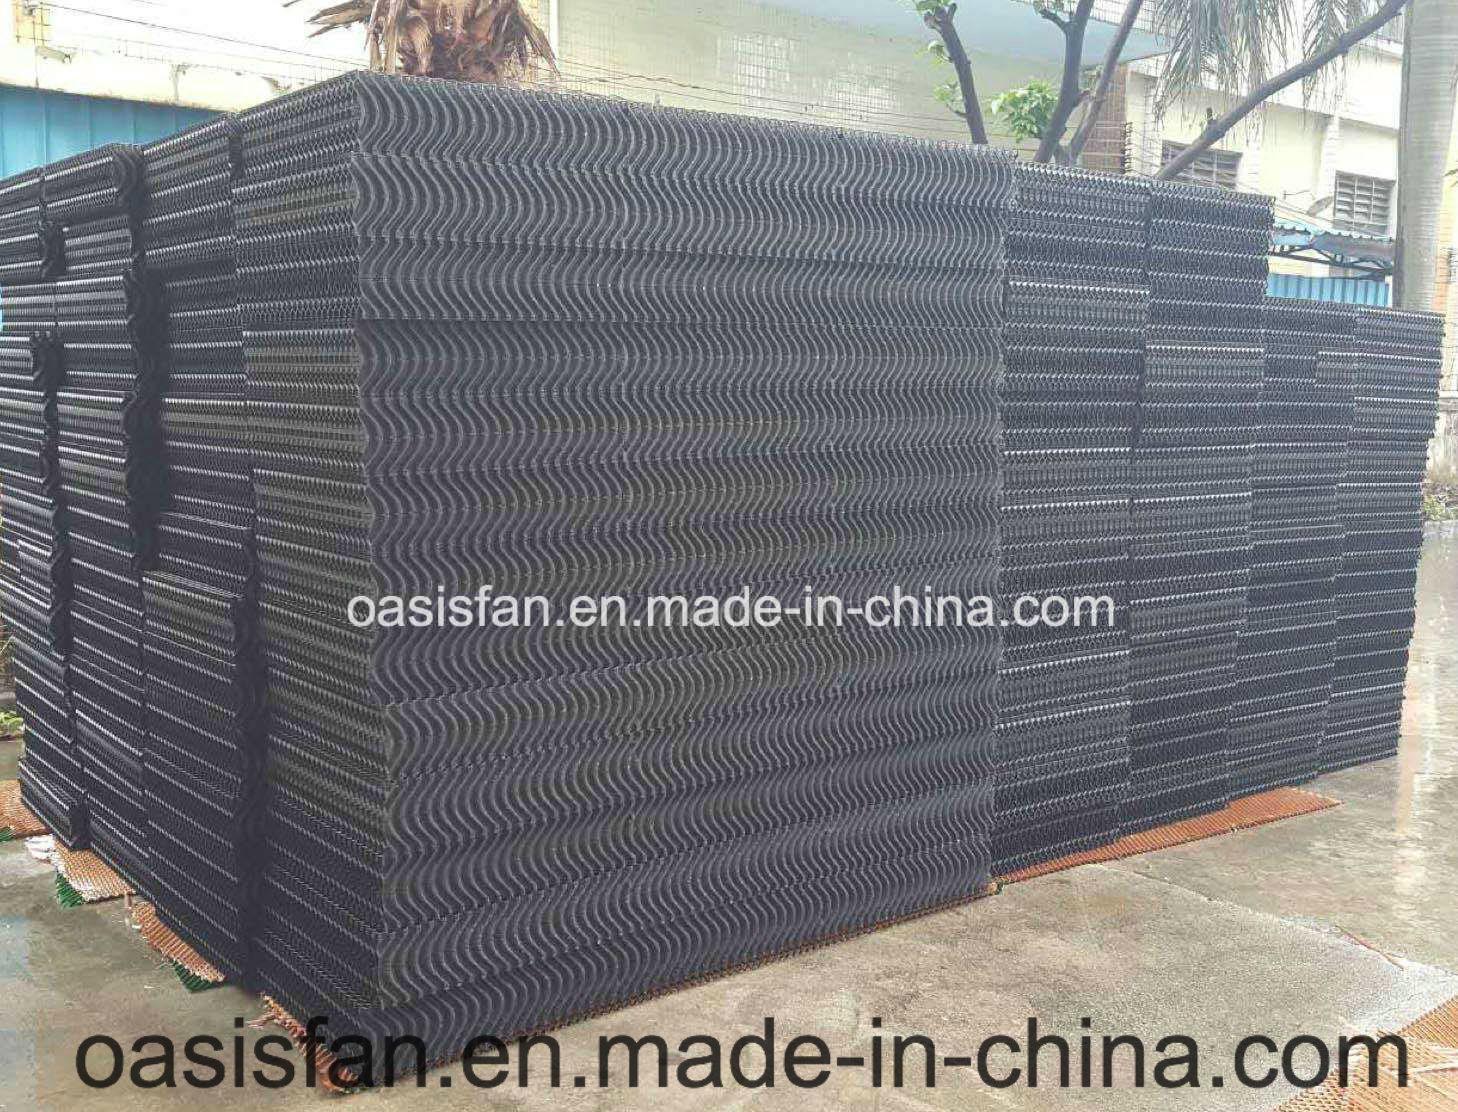 PVC evaporative cooling pad/ cooling pad/ PVC cooling pad/ Evaporative Media